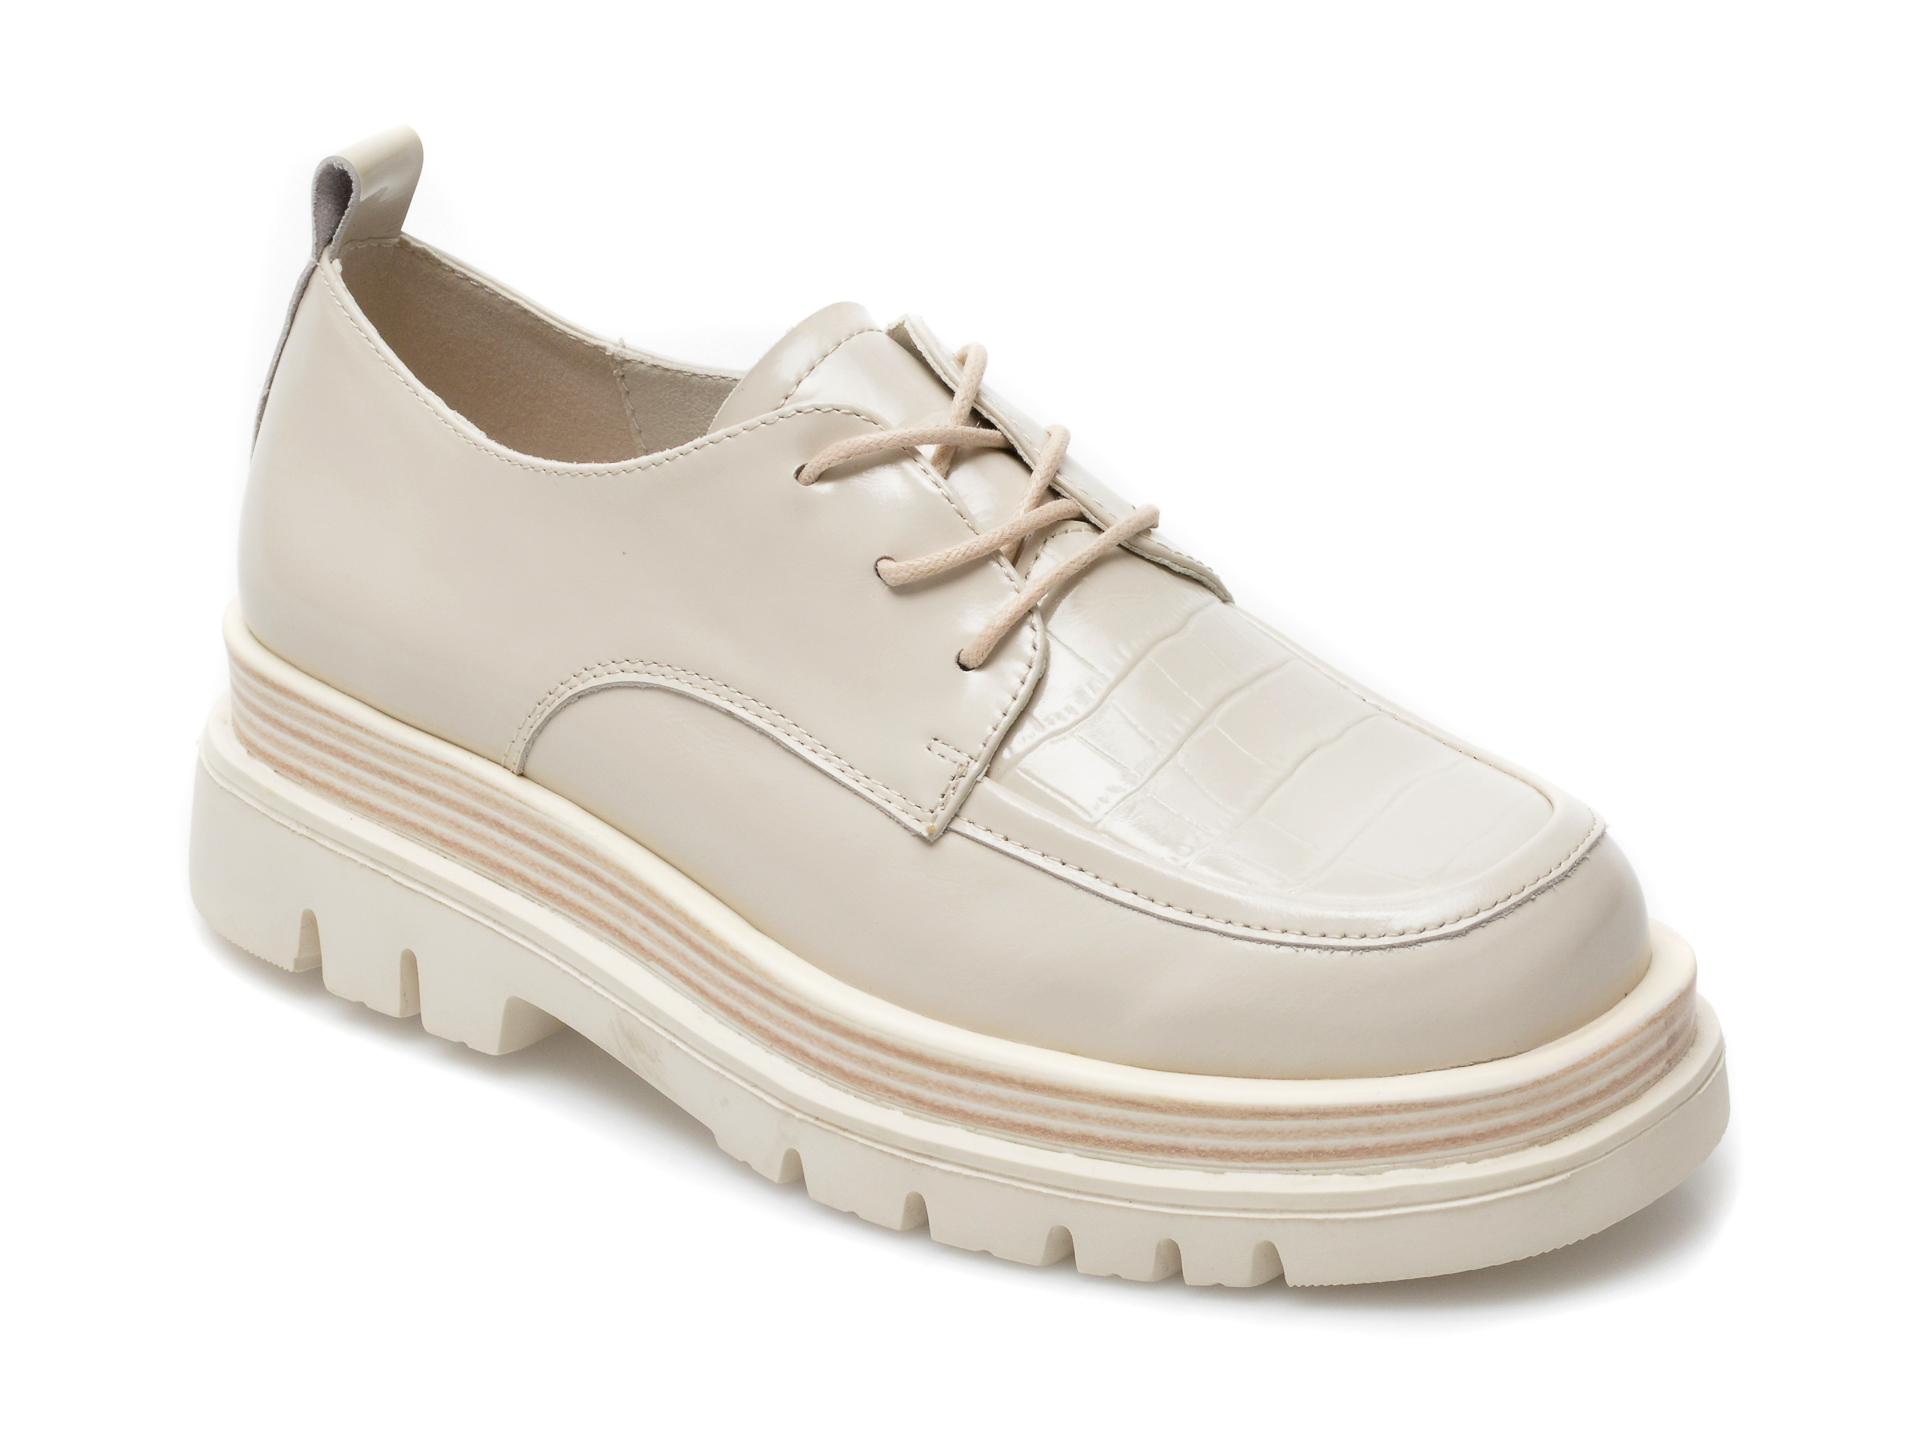 Pantofi GRYXX bej, Z045, din piele naturala imagine otter.ro 2021